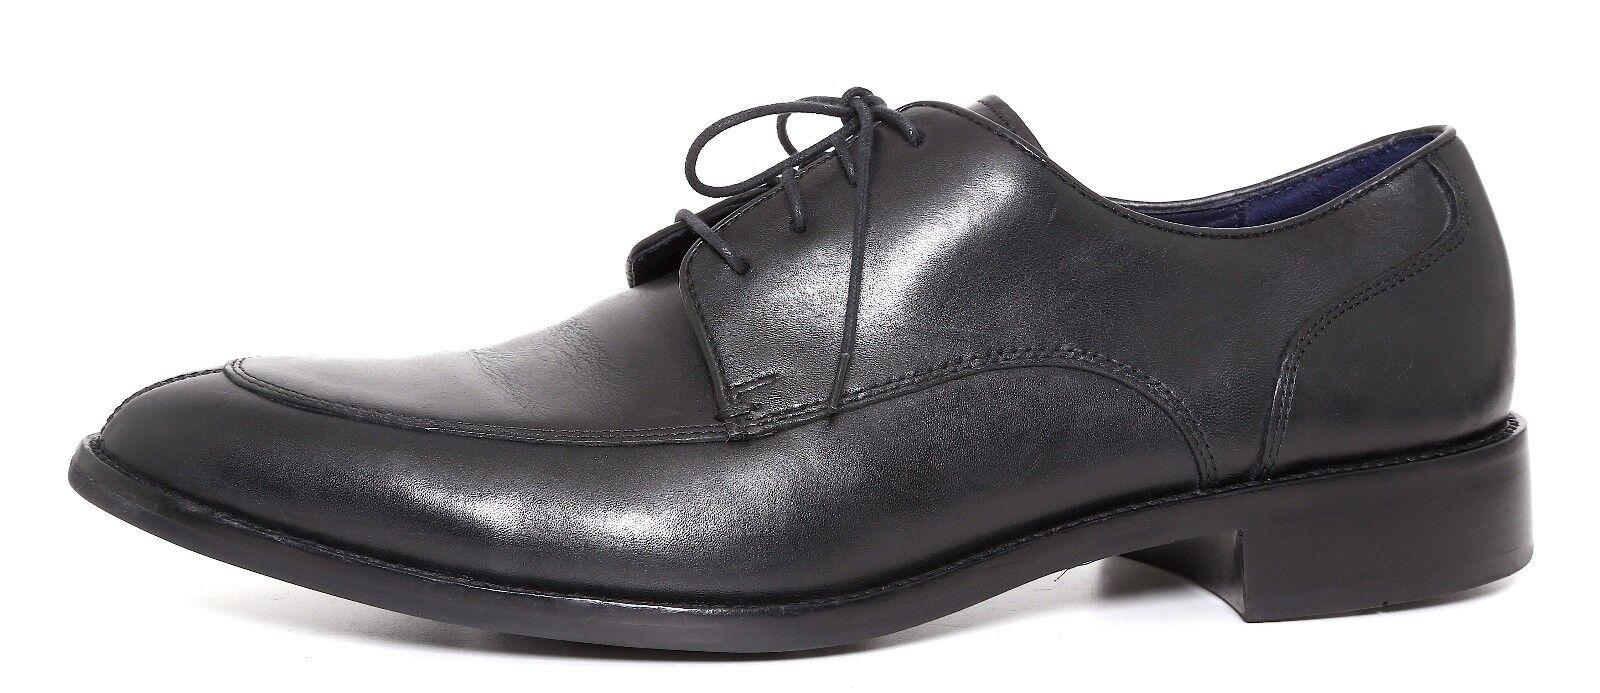 Cole Haan Lenox Hill Split Toe en Cuir Derby Noir Hommes Sz 10.5 m 1817